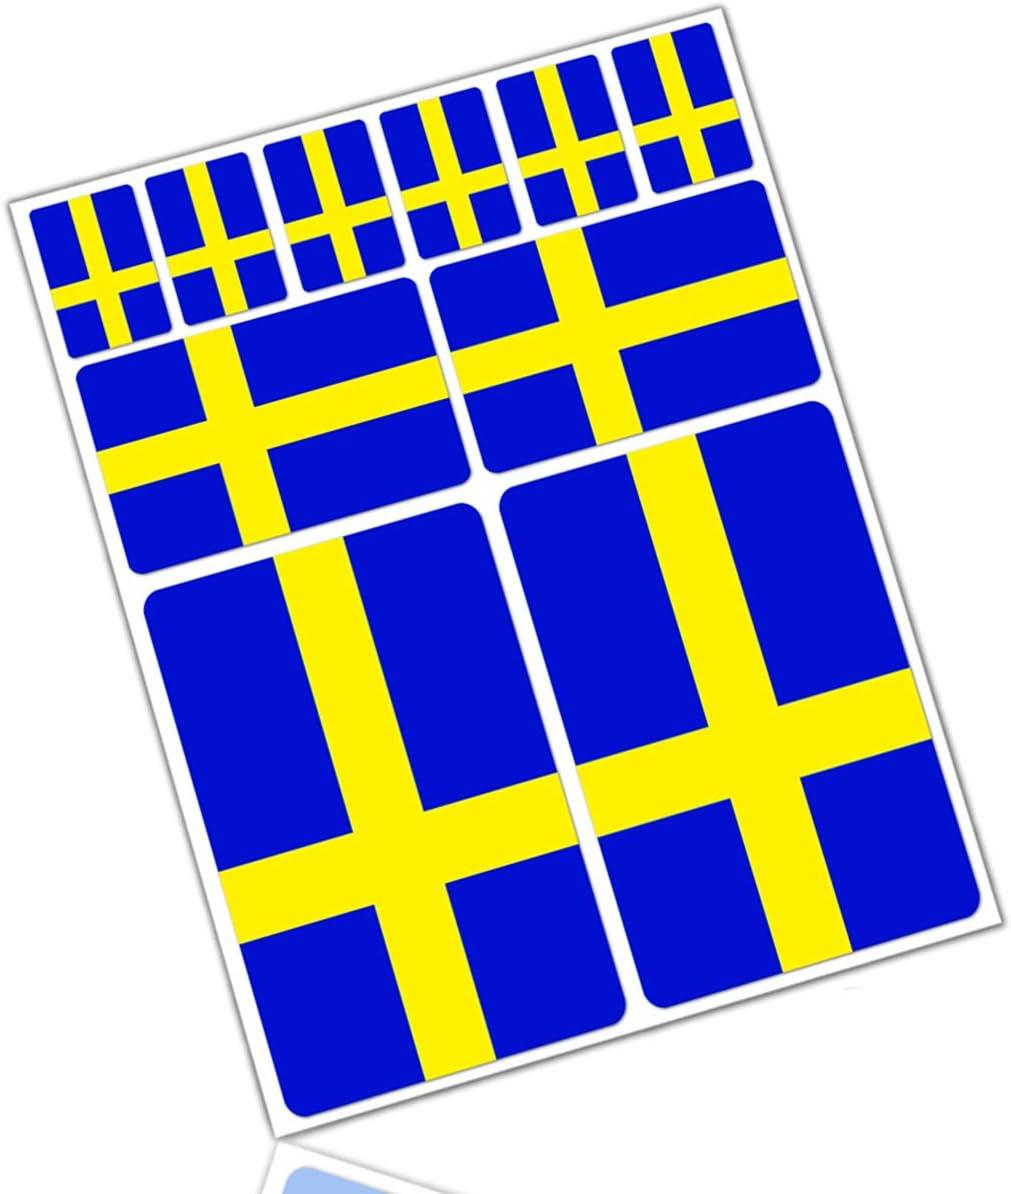 Biomar Labs 10 X Vinyl Aufkleber Autoaufkleber Stickers Fahne Flagge Sweden Schweden Schwedisch Auto Moto Motorrad Fahrrad Scooter Fenster D 25 Auto